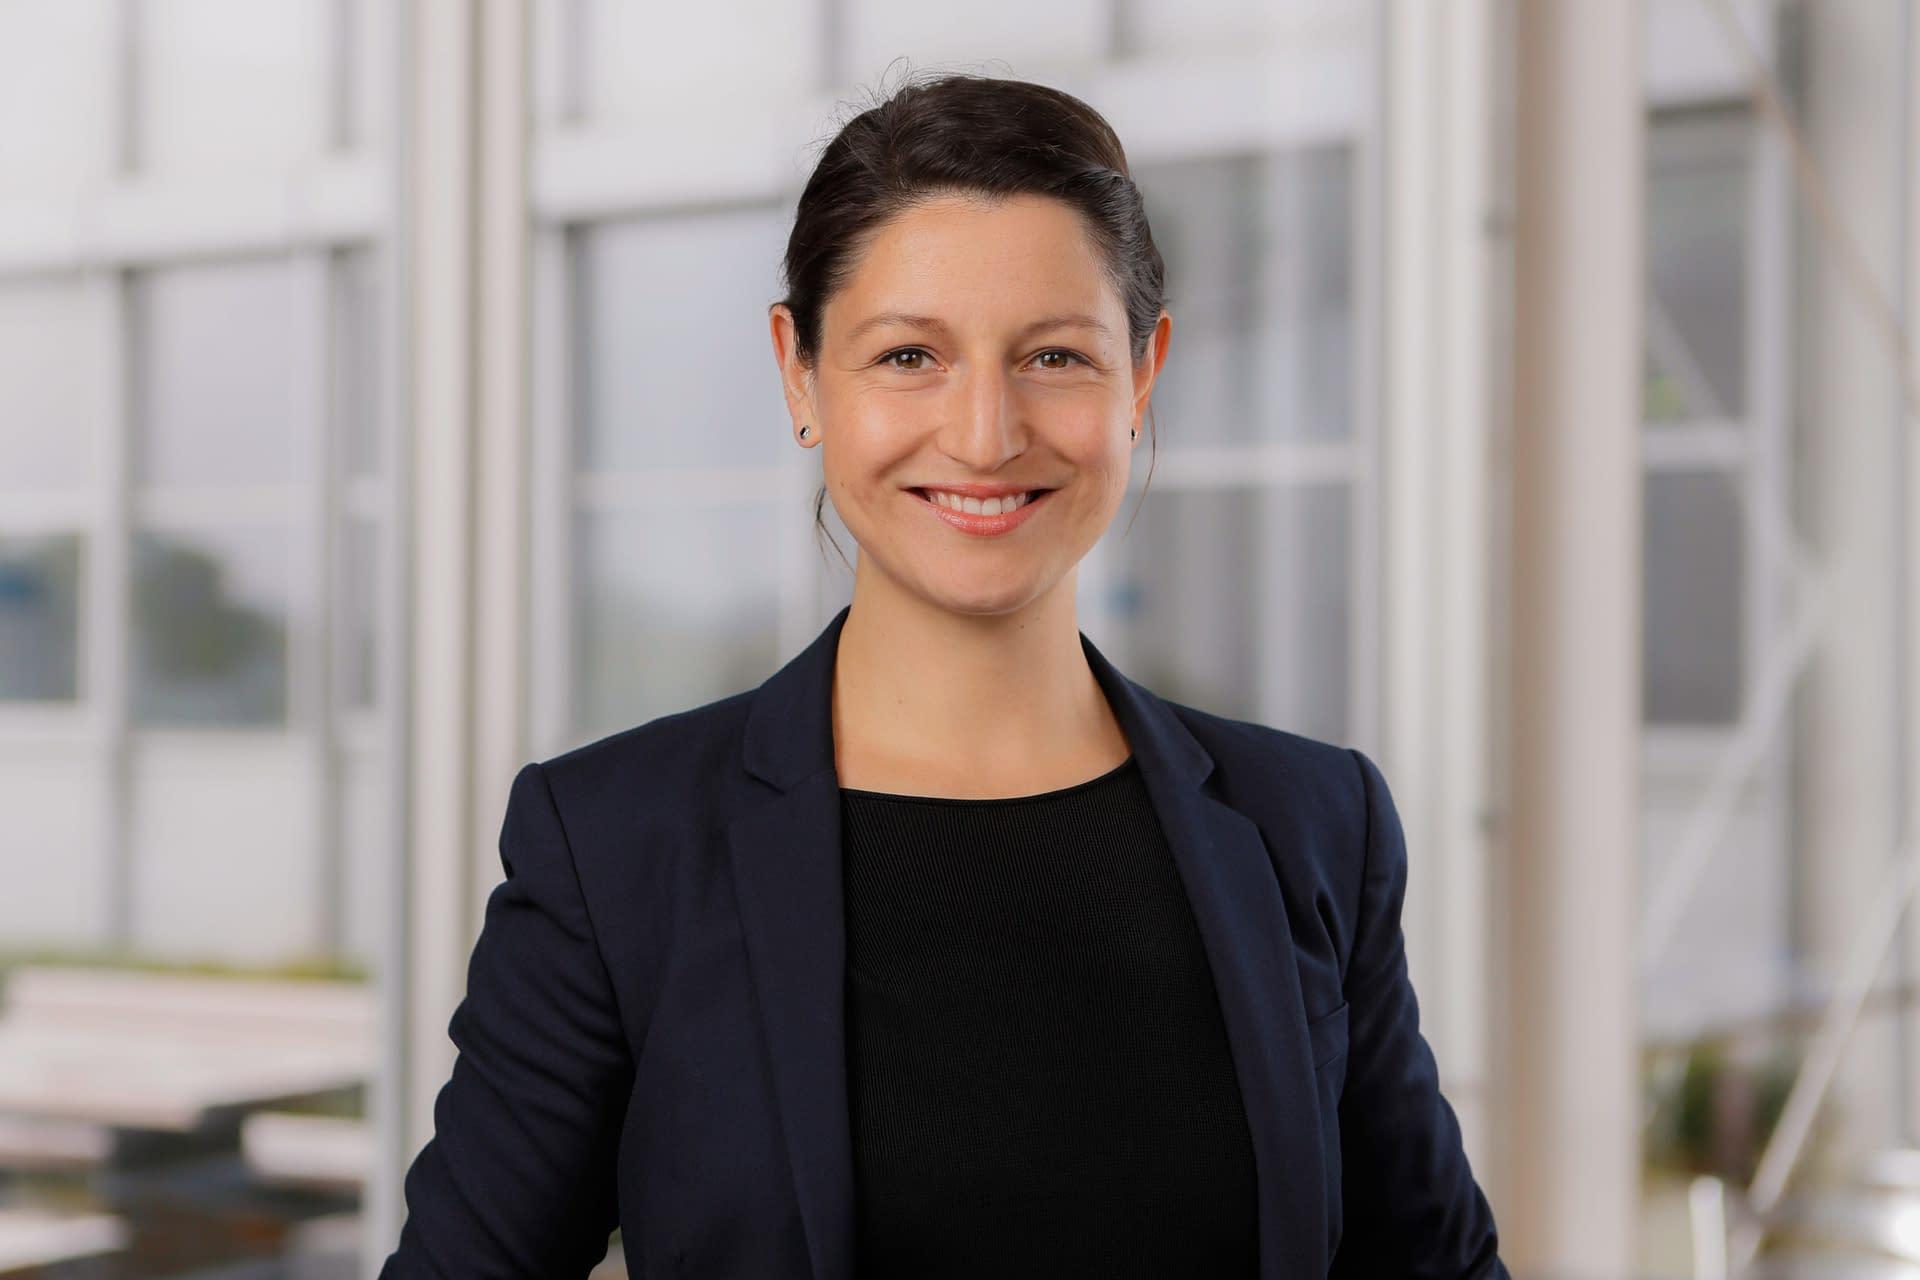 Dr. Salome Zimmermann